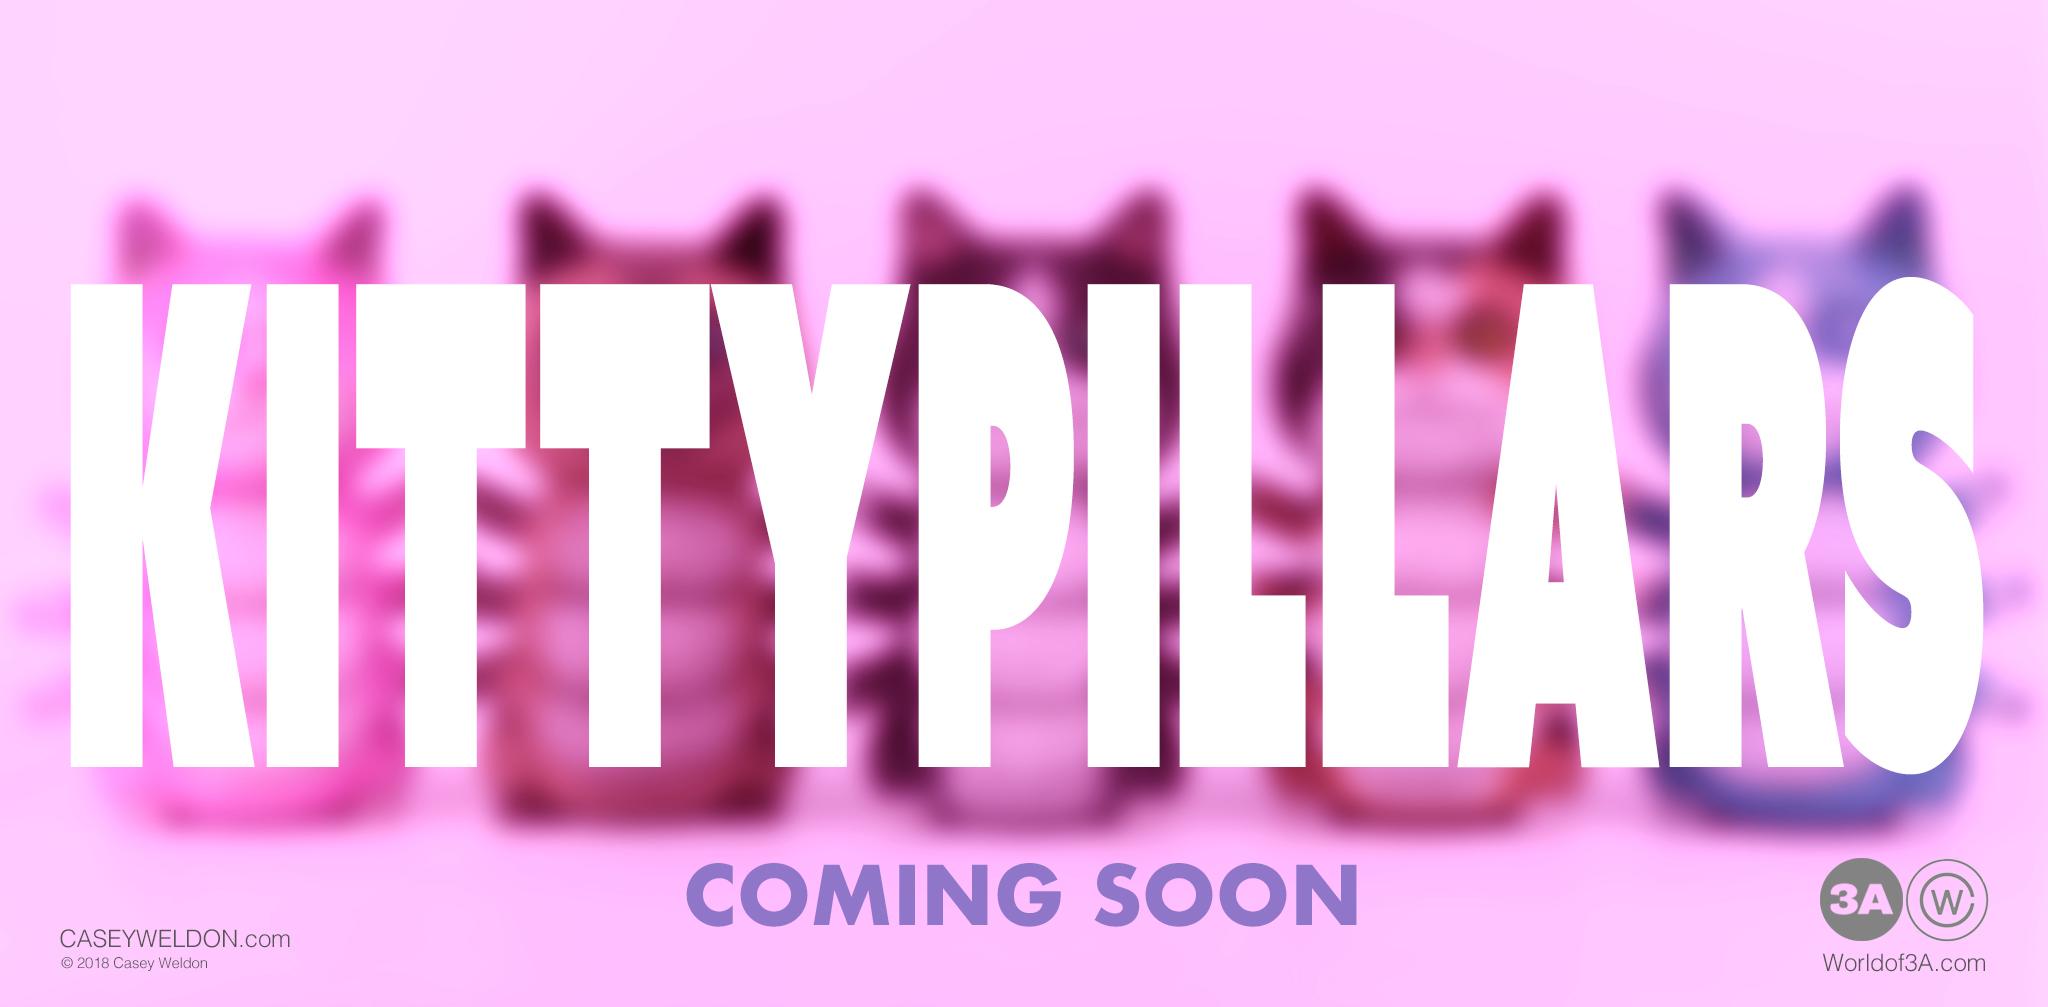 3A_kittypillars_comingsoon_ad003.jpg